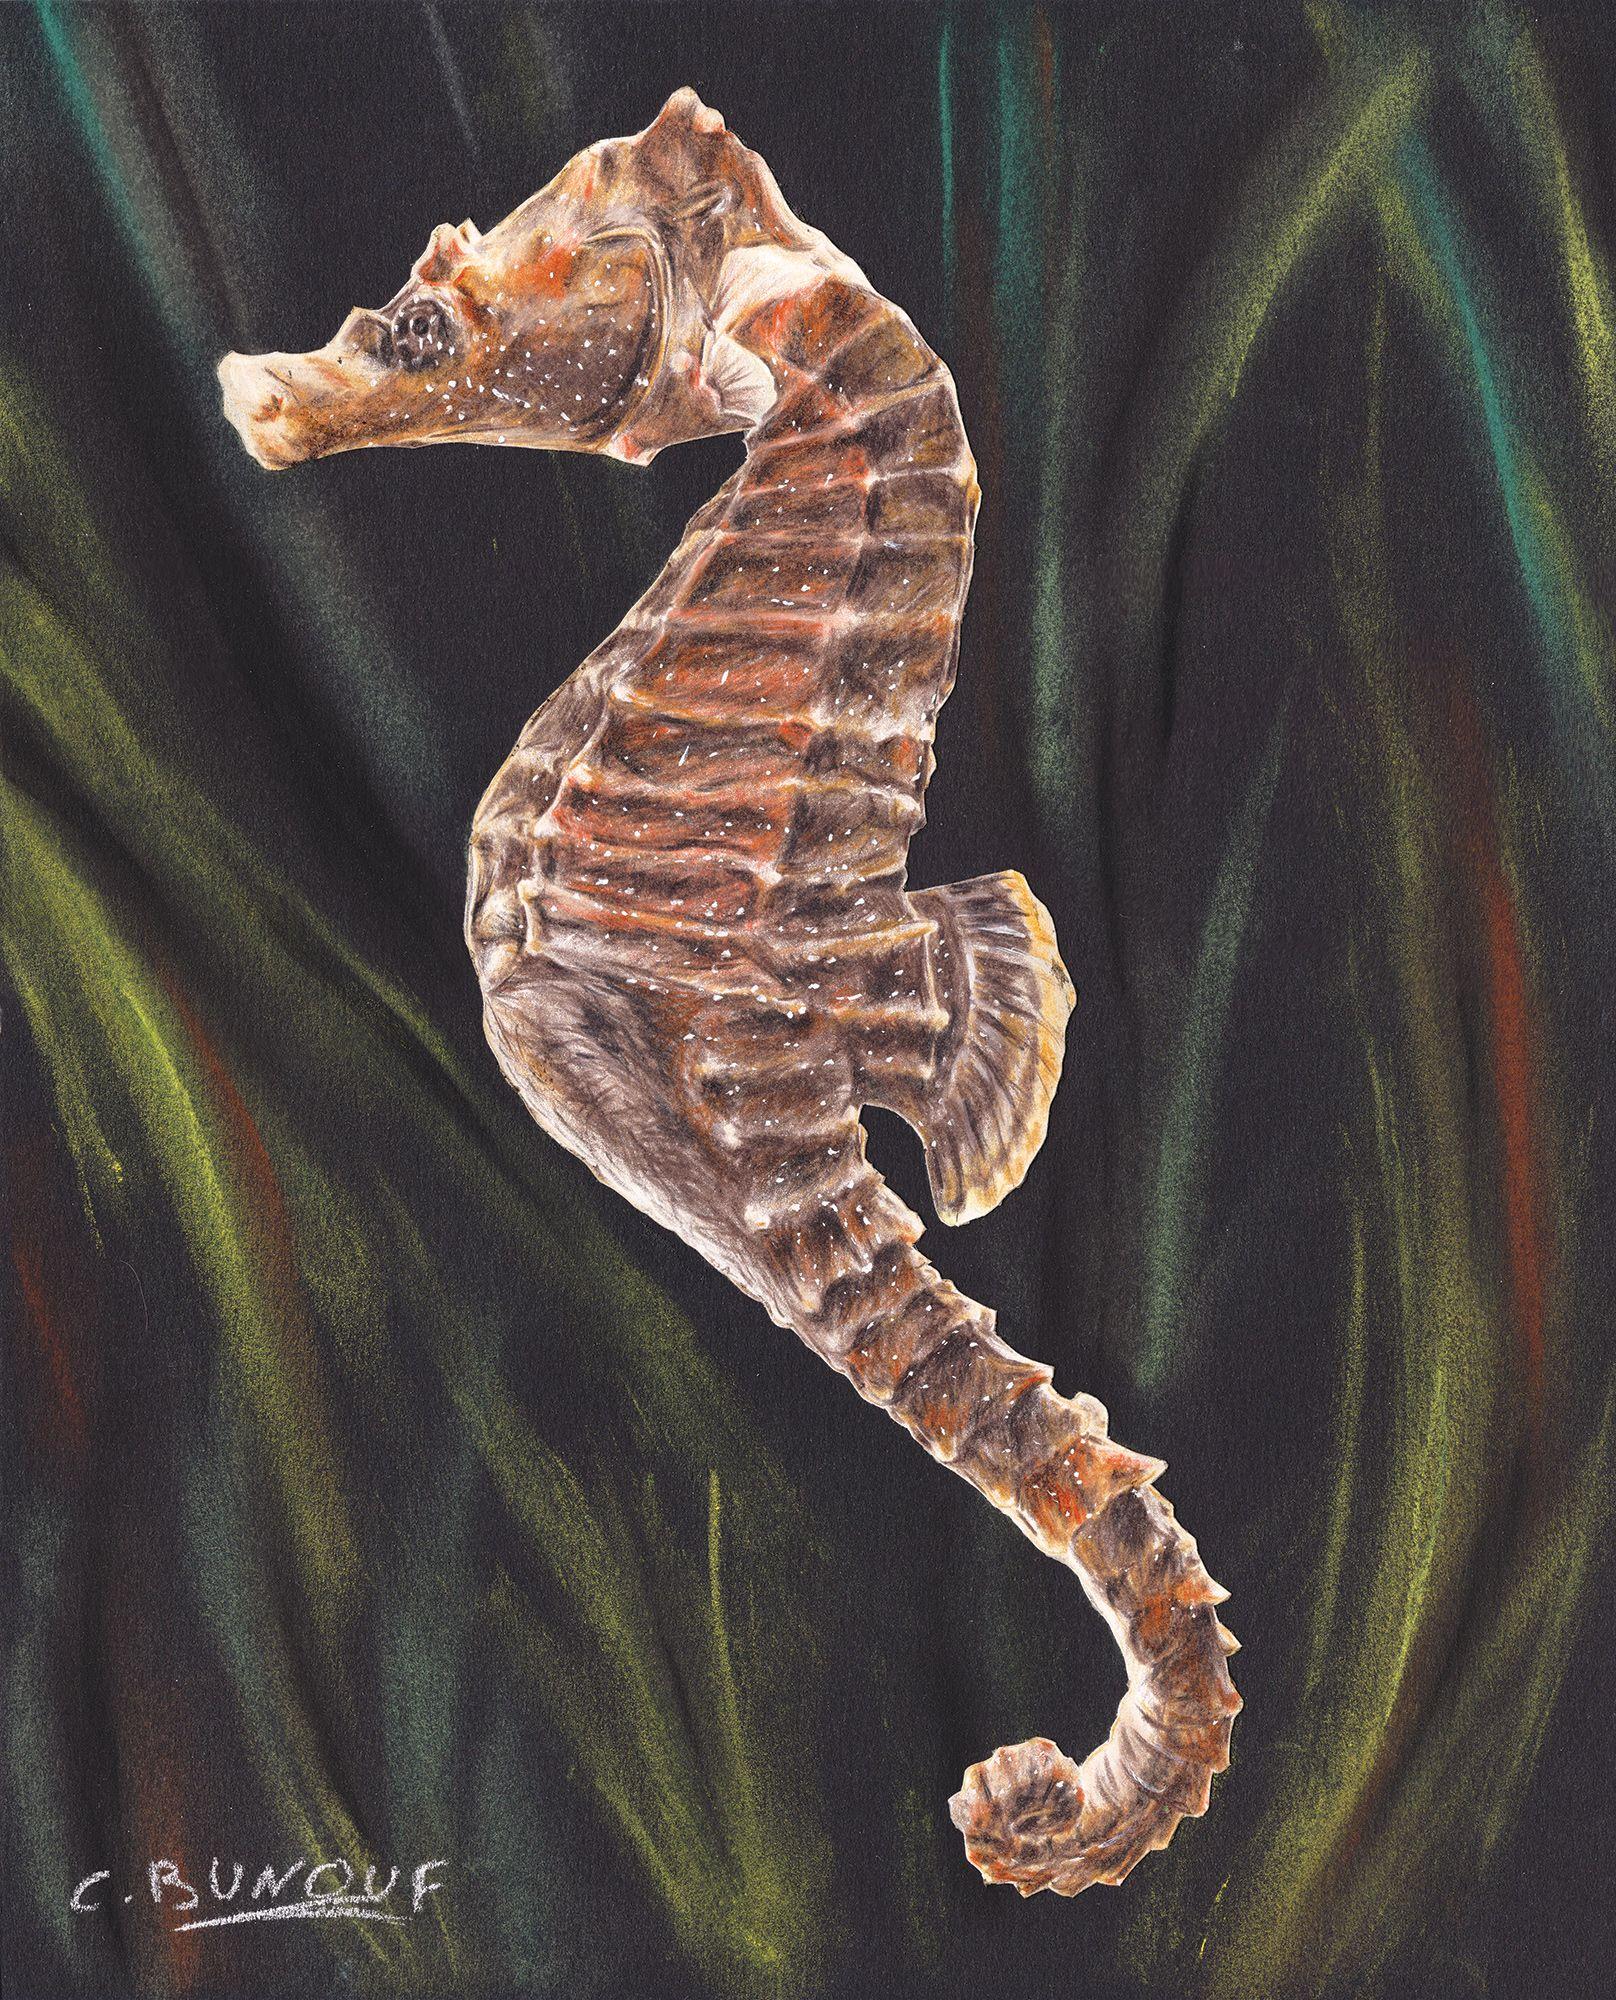 Hippocampe Animal Crayons De Couleurs Pastel Dessin